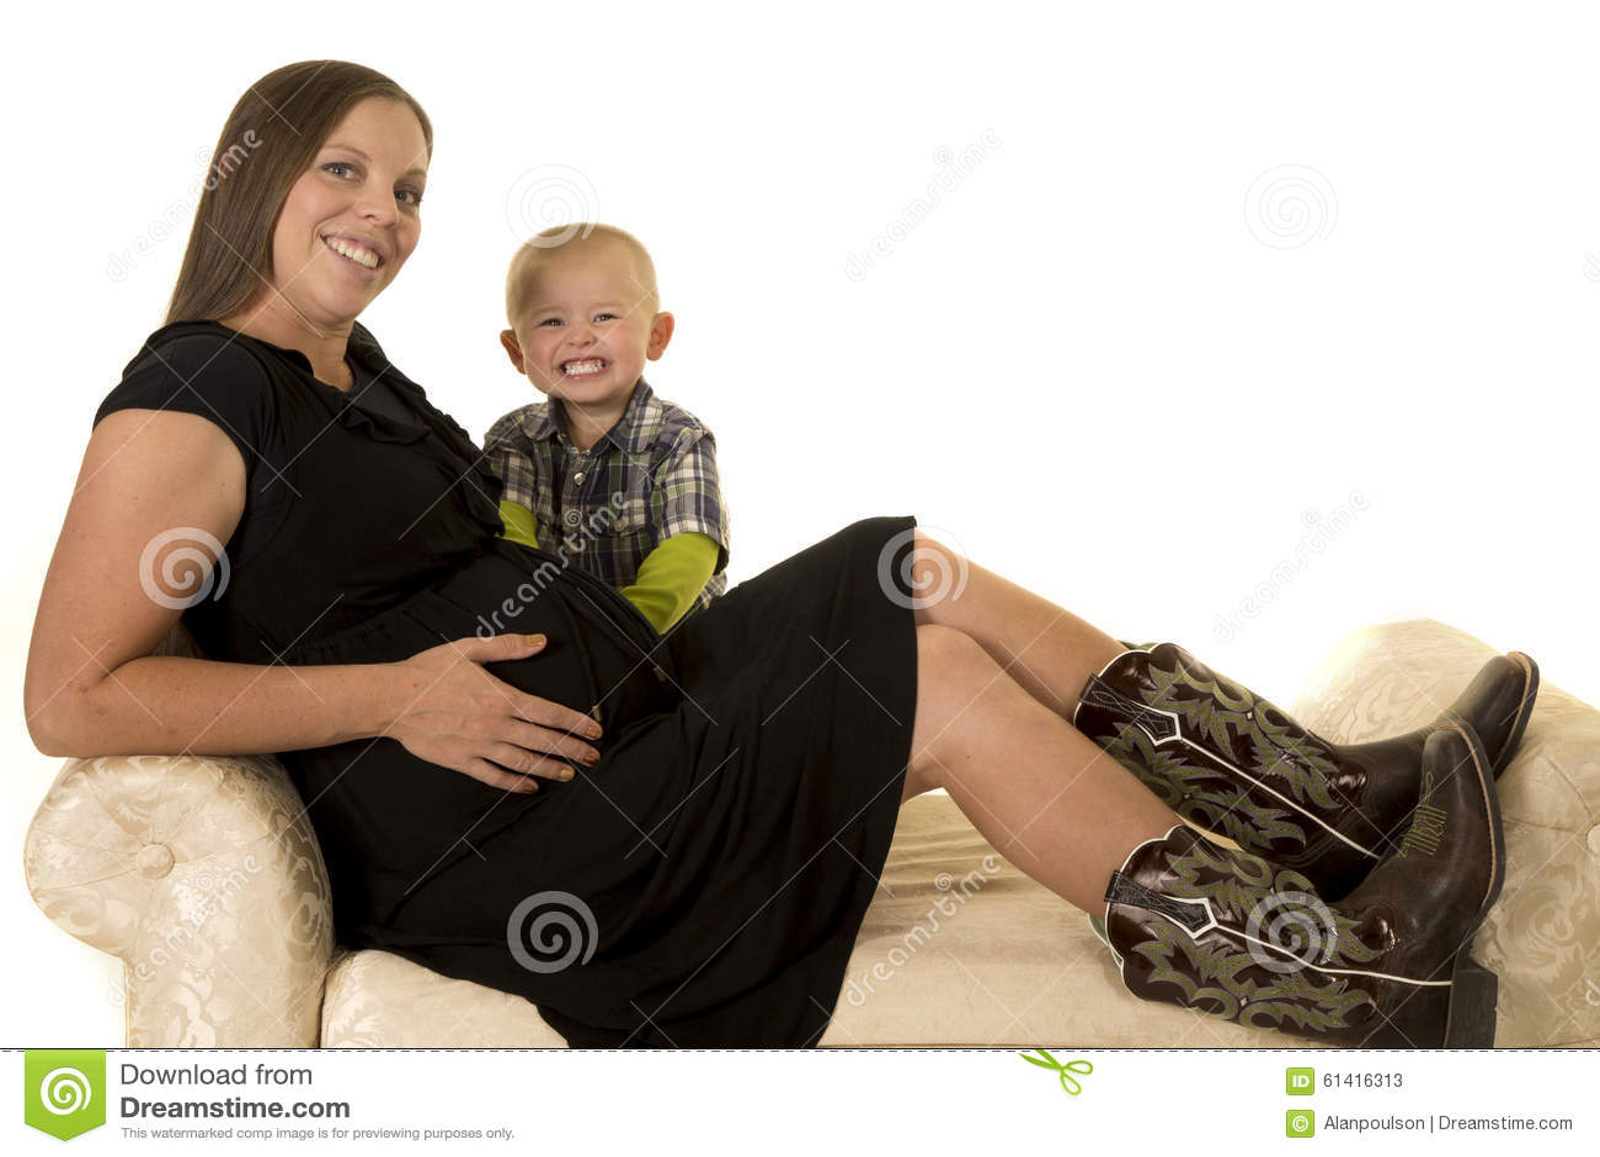 Small boy and big women